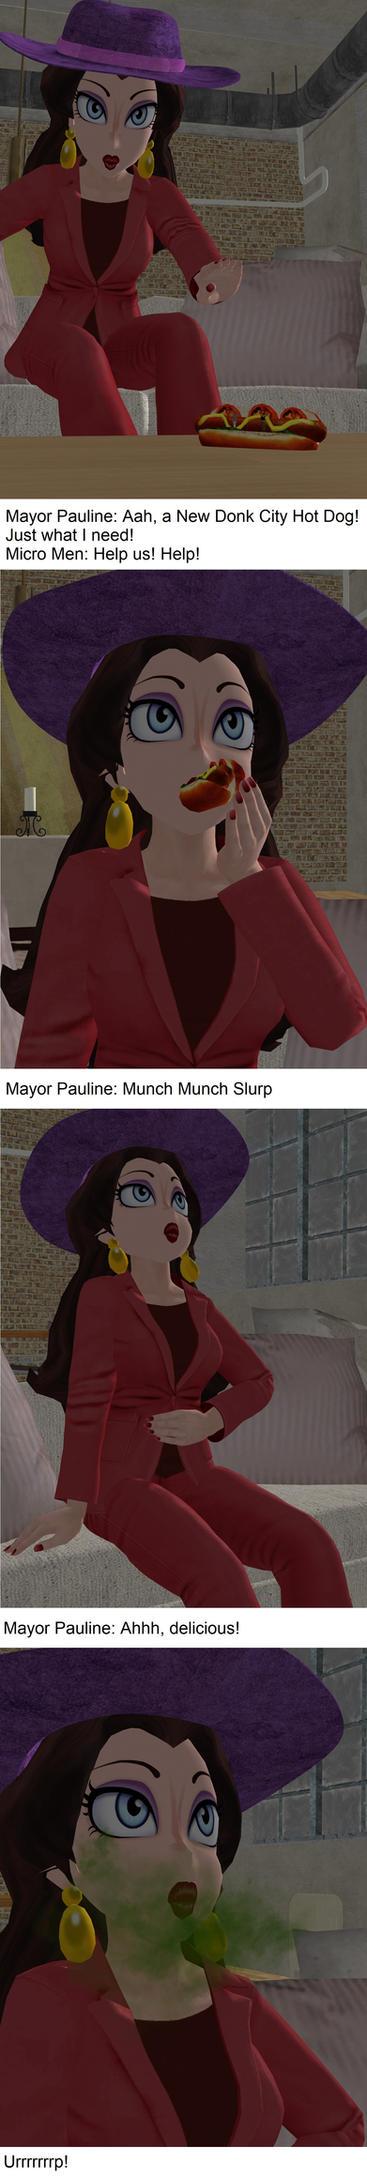 Mayor Pauline GTS Pt 3 by roodedude